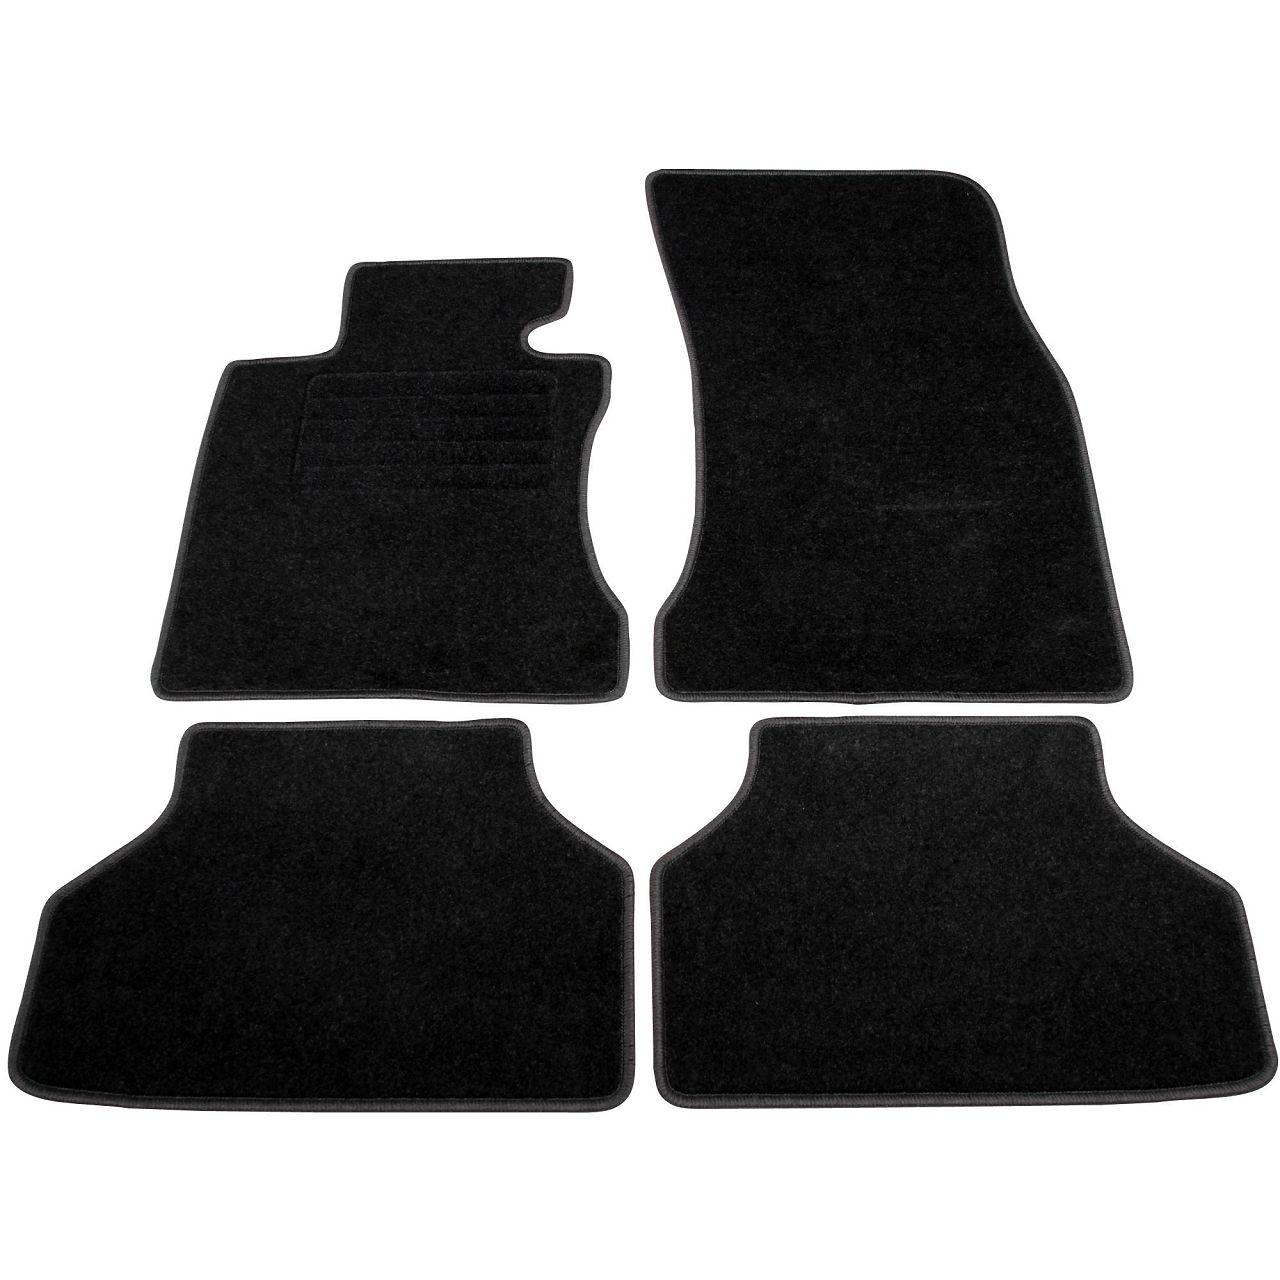 Veloursmatten Textilmatten Fußmatten BMW 5er E60 E61 Limousine + Kombi 4-tlg.